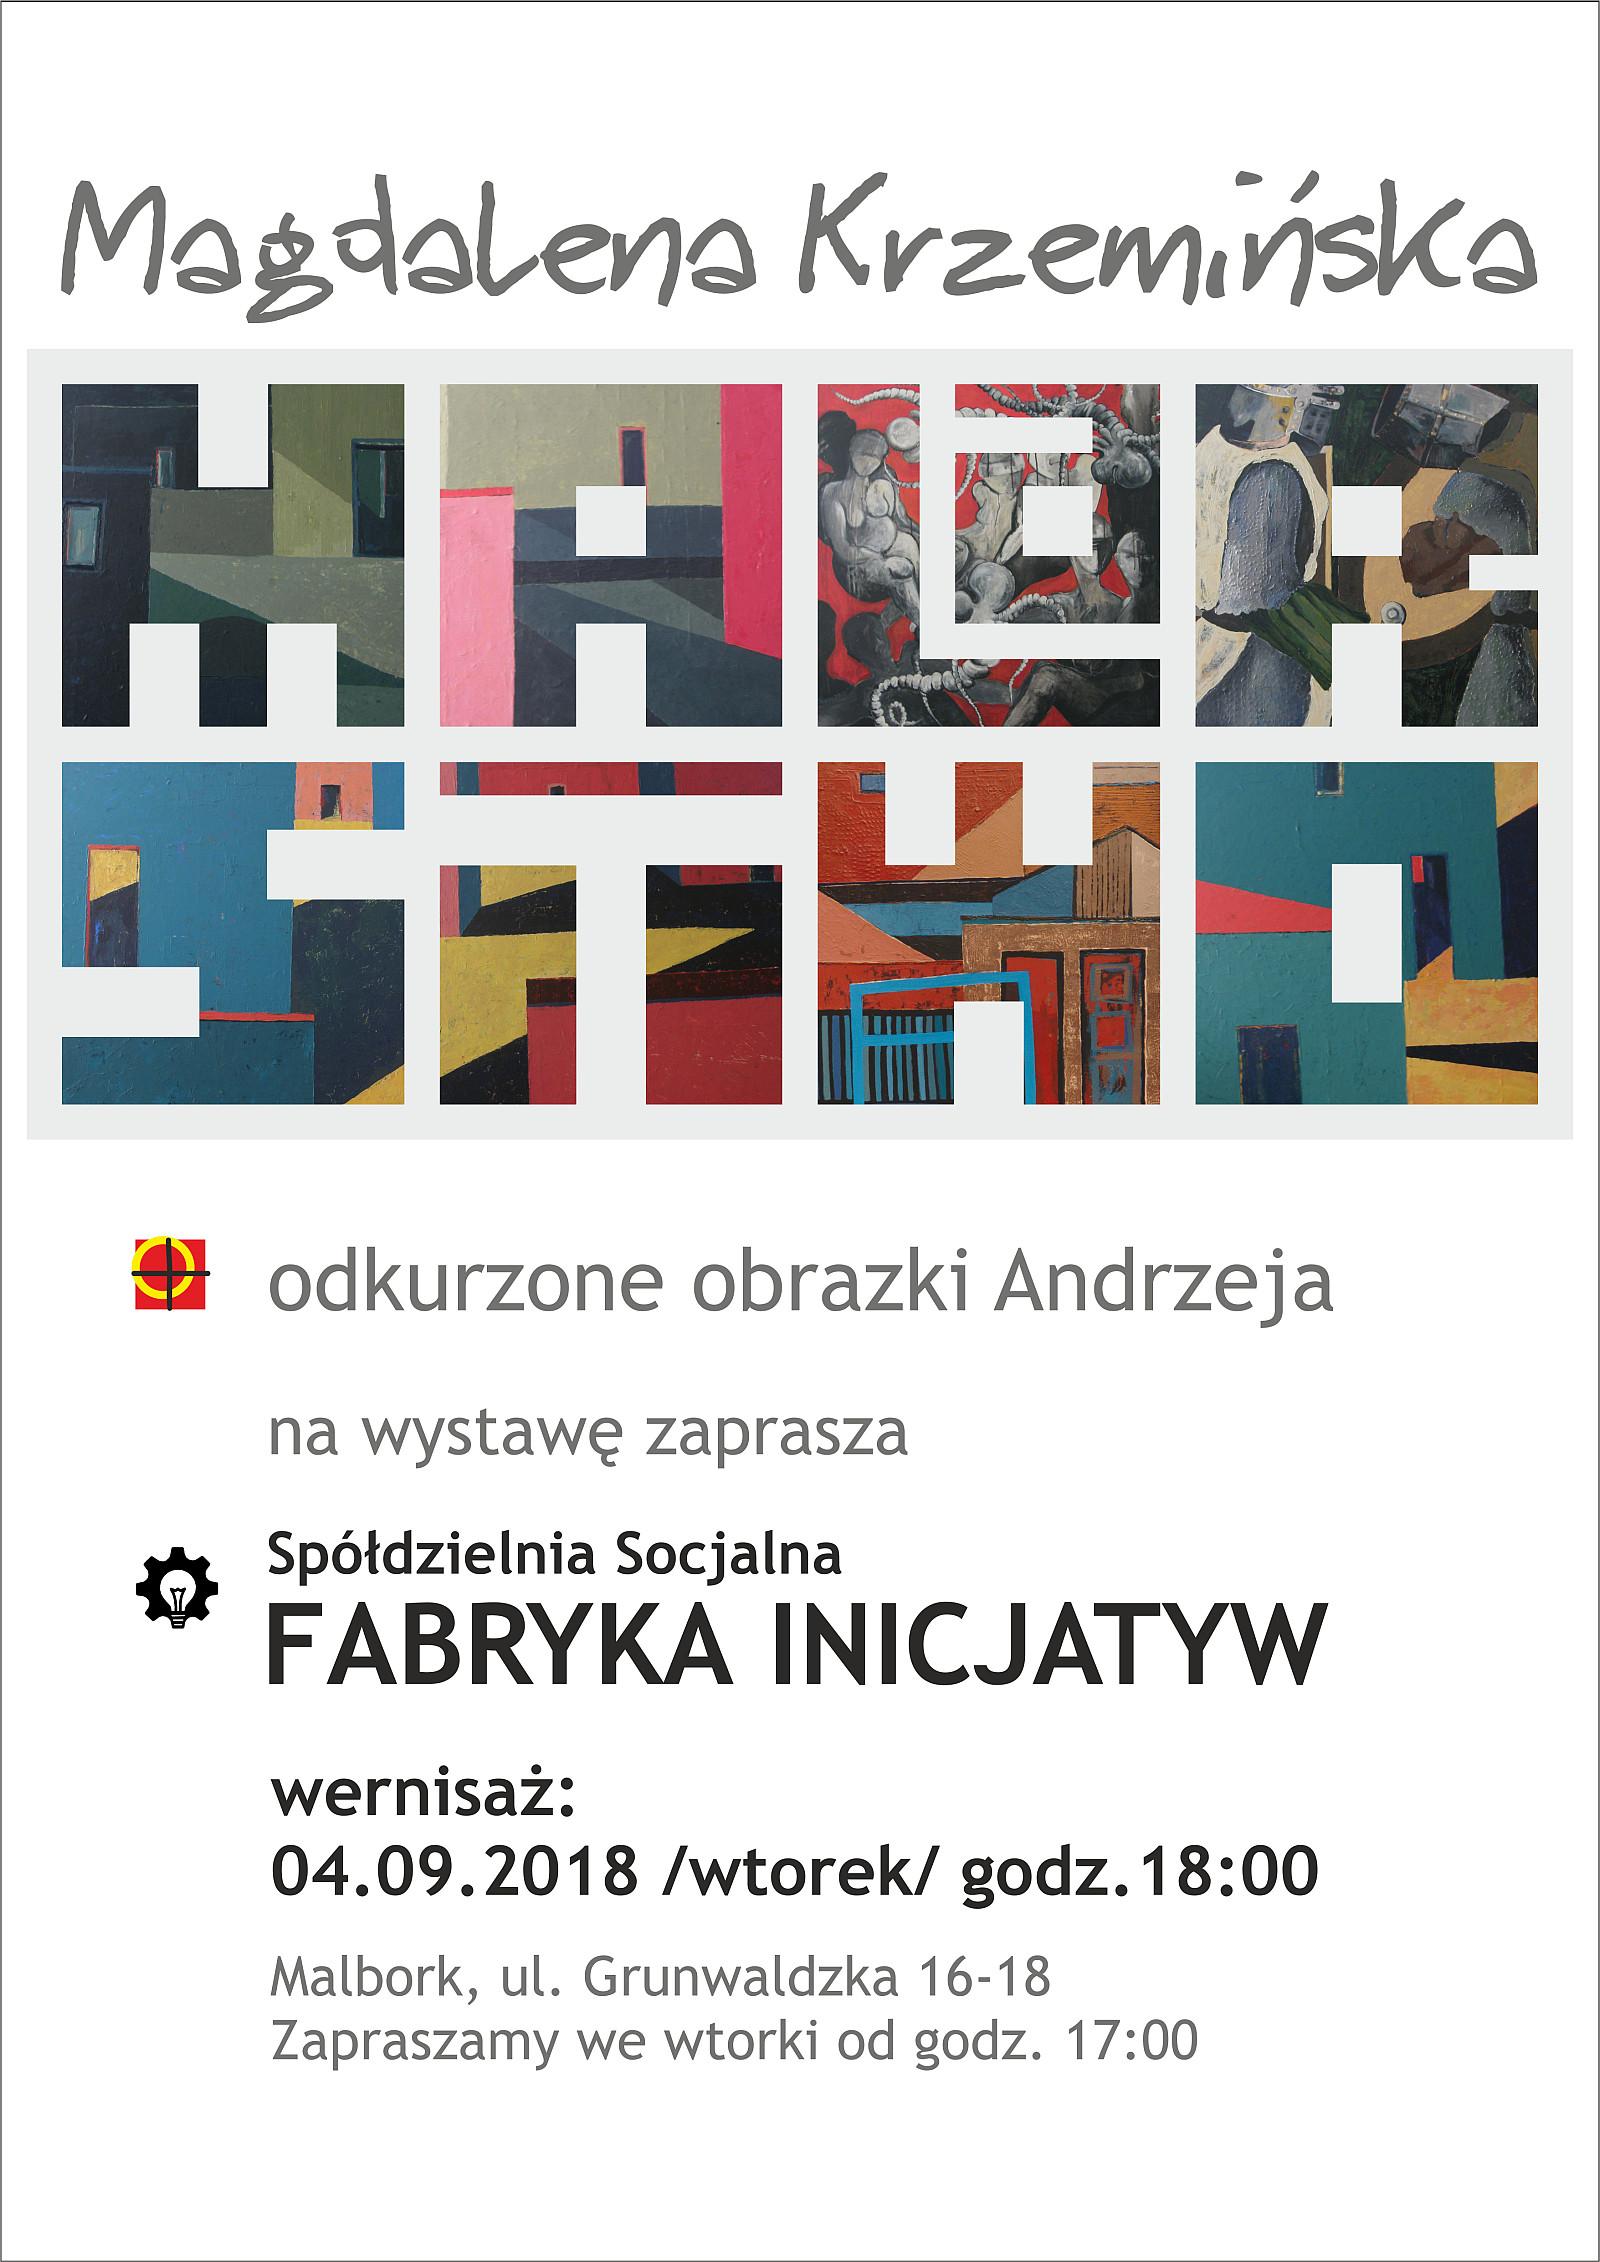 http://m.82-200.pl/2018/08/orig/wernisaz-plakat-3416.jpg